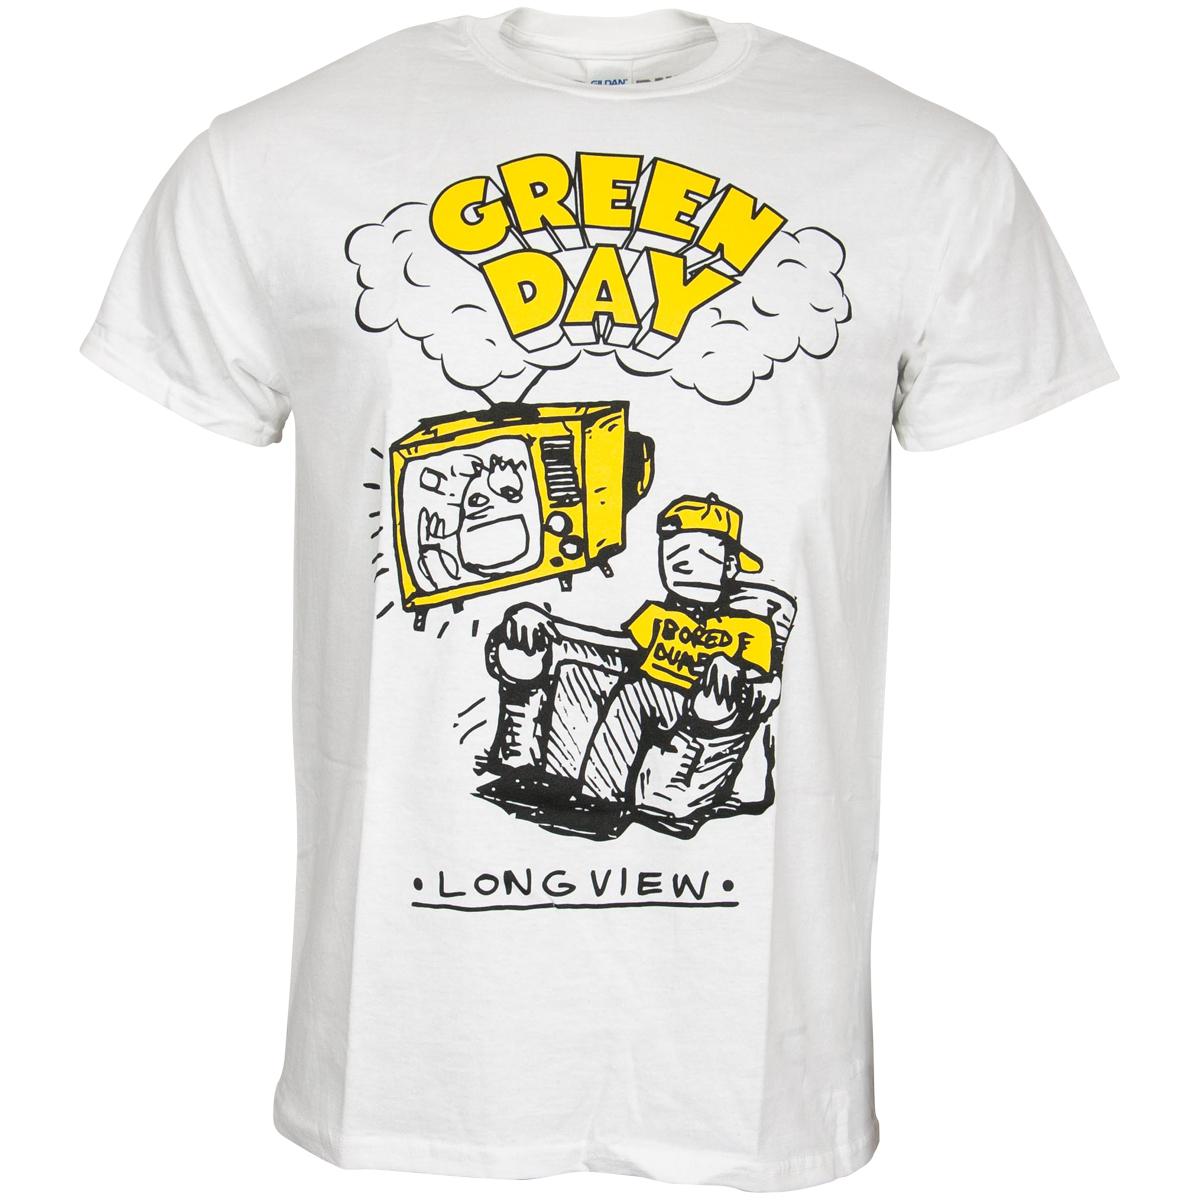 Green Day - T-Shirt Longview Doodle - weiß